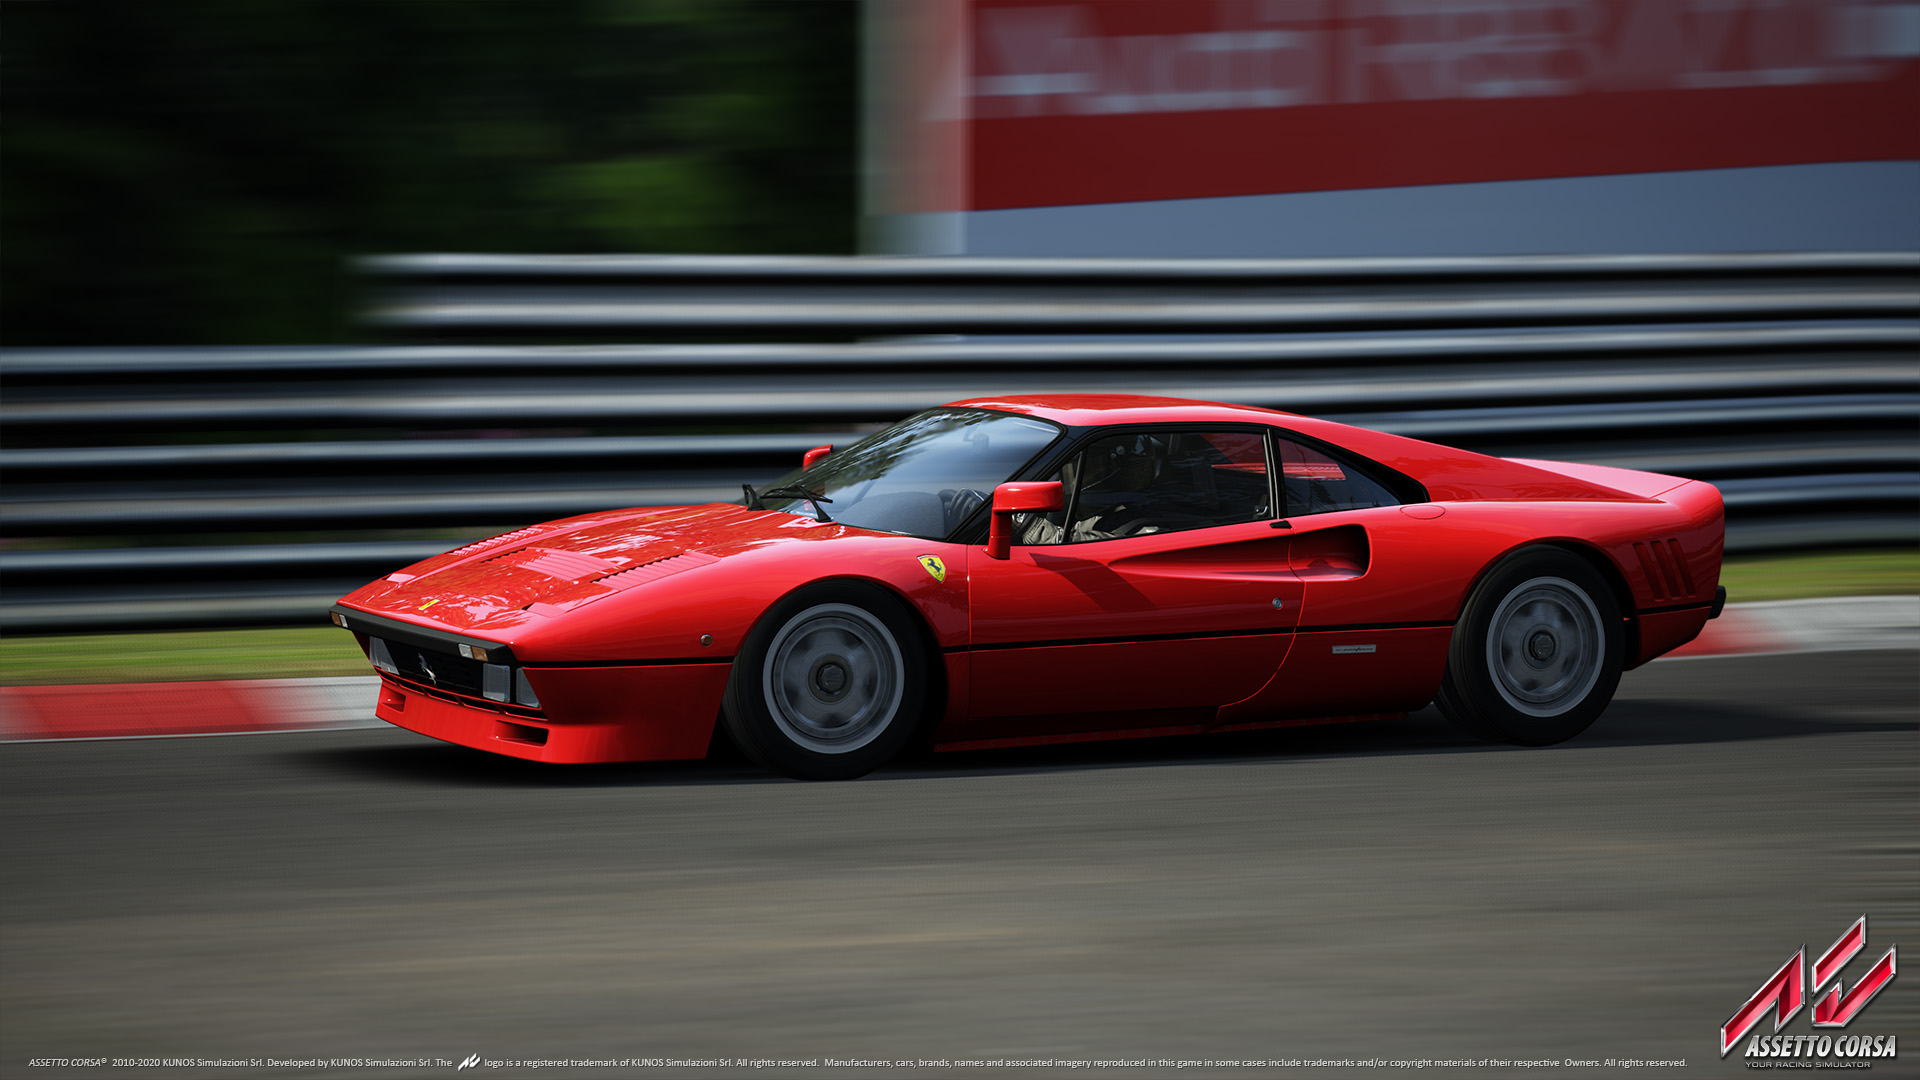 Assetto Corsa - Ferrari 70th Anniversary Pack